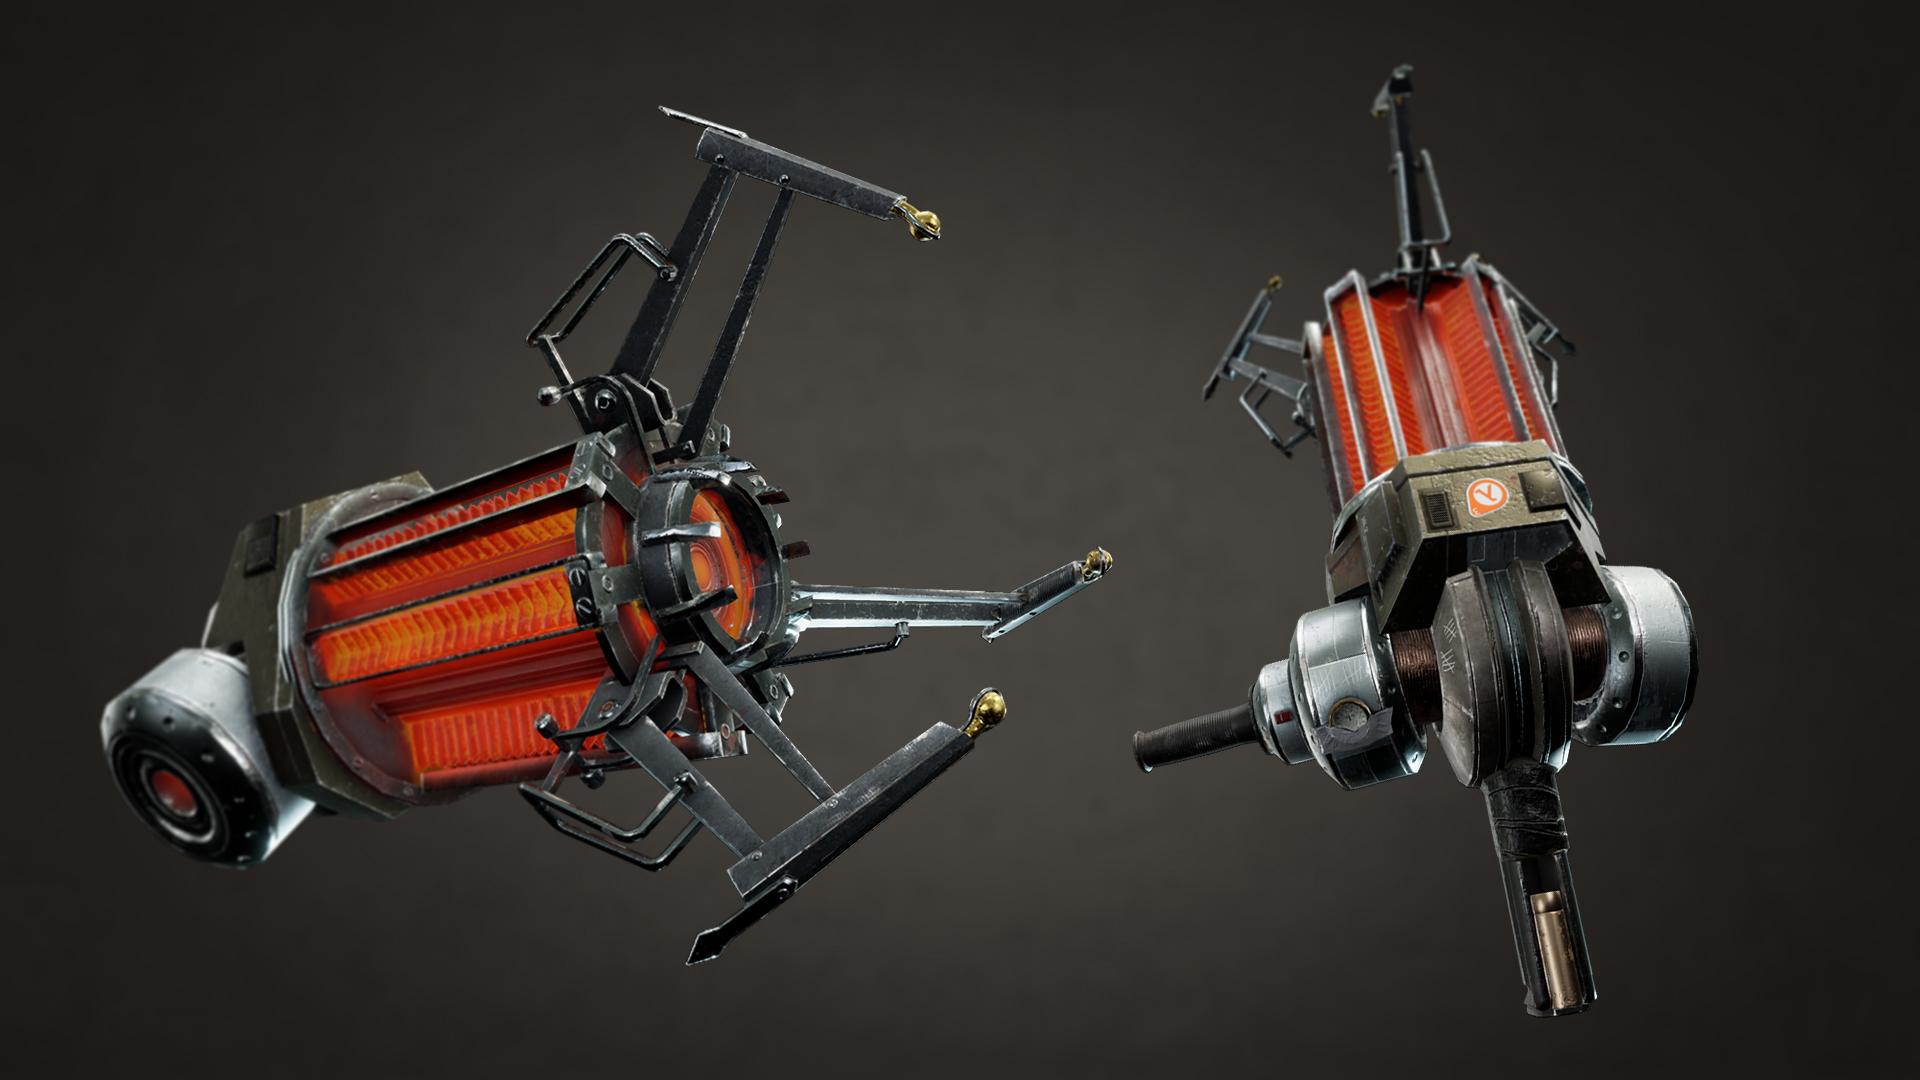 Half Life 2 - Gravity gun   The Rookies